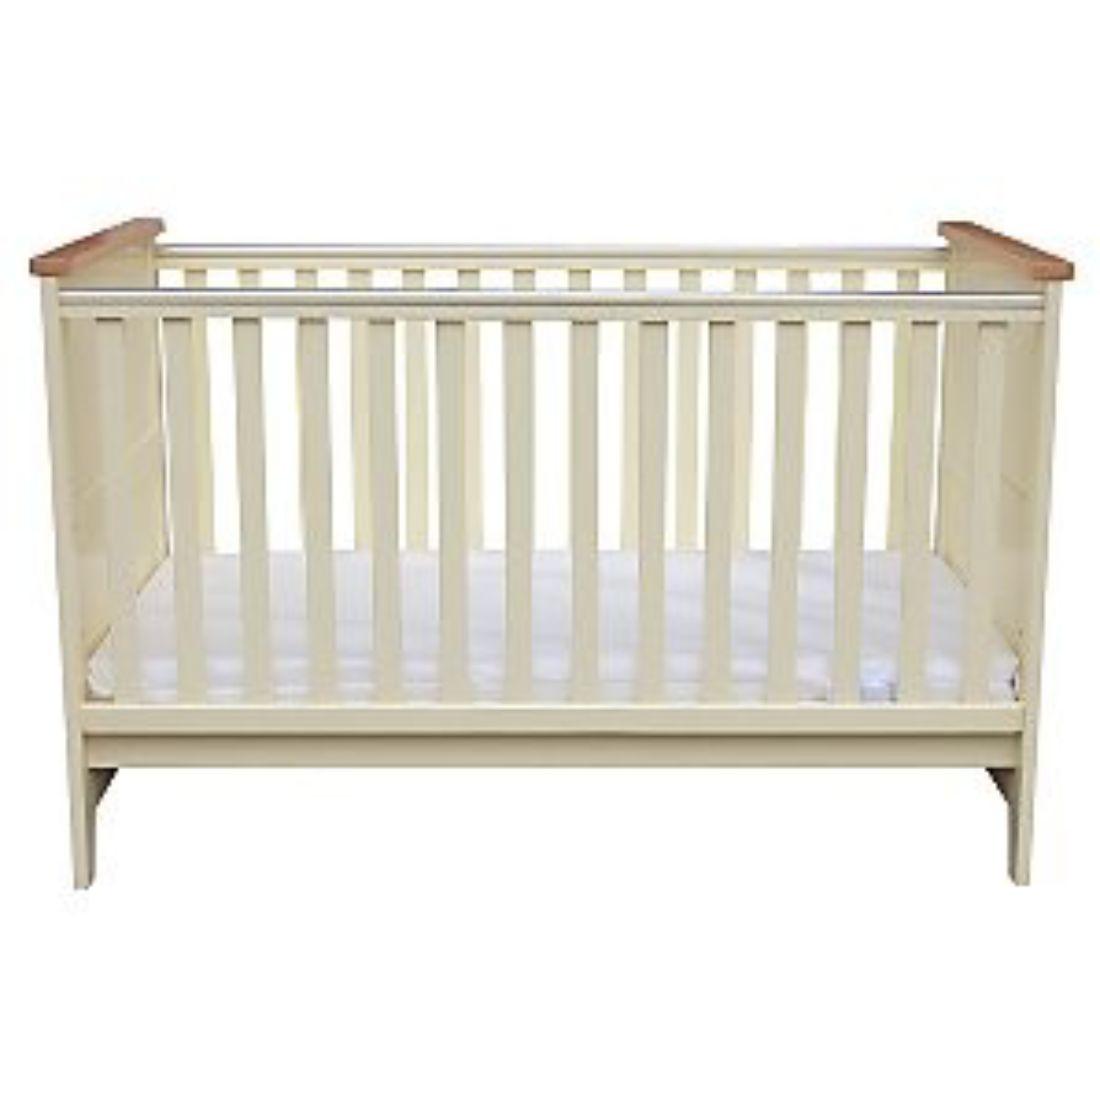 Mattress To Fit John Lewis Nouveau Cot Bed Mattress Size